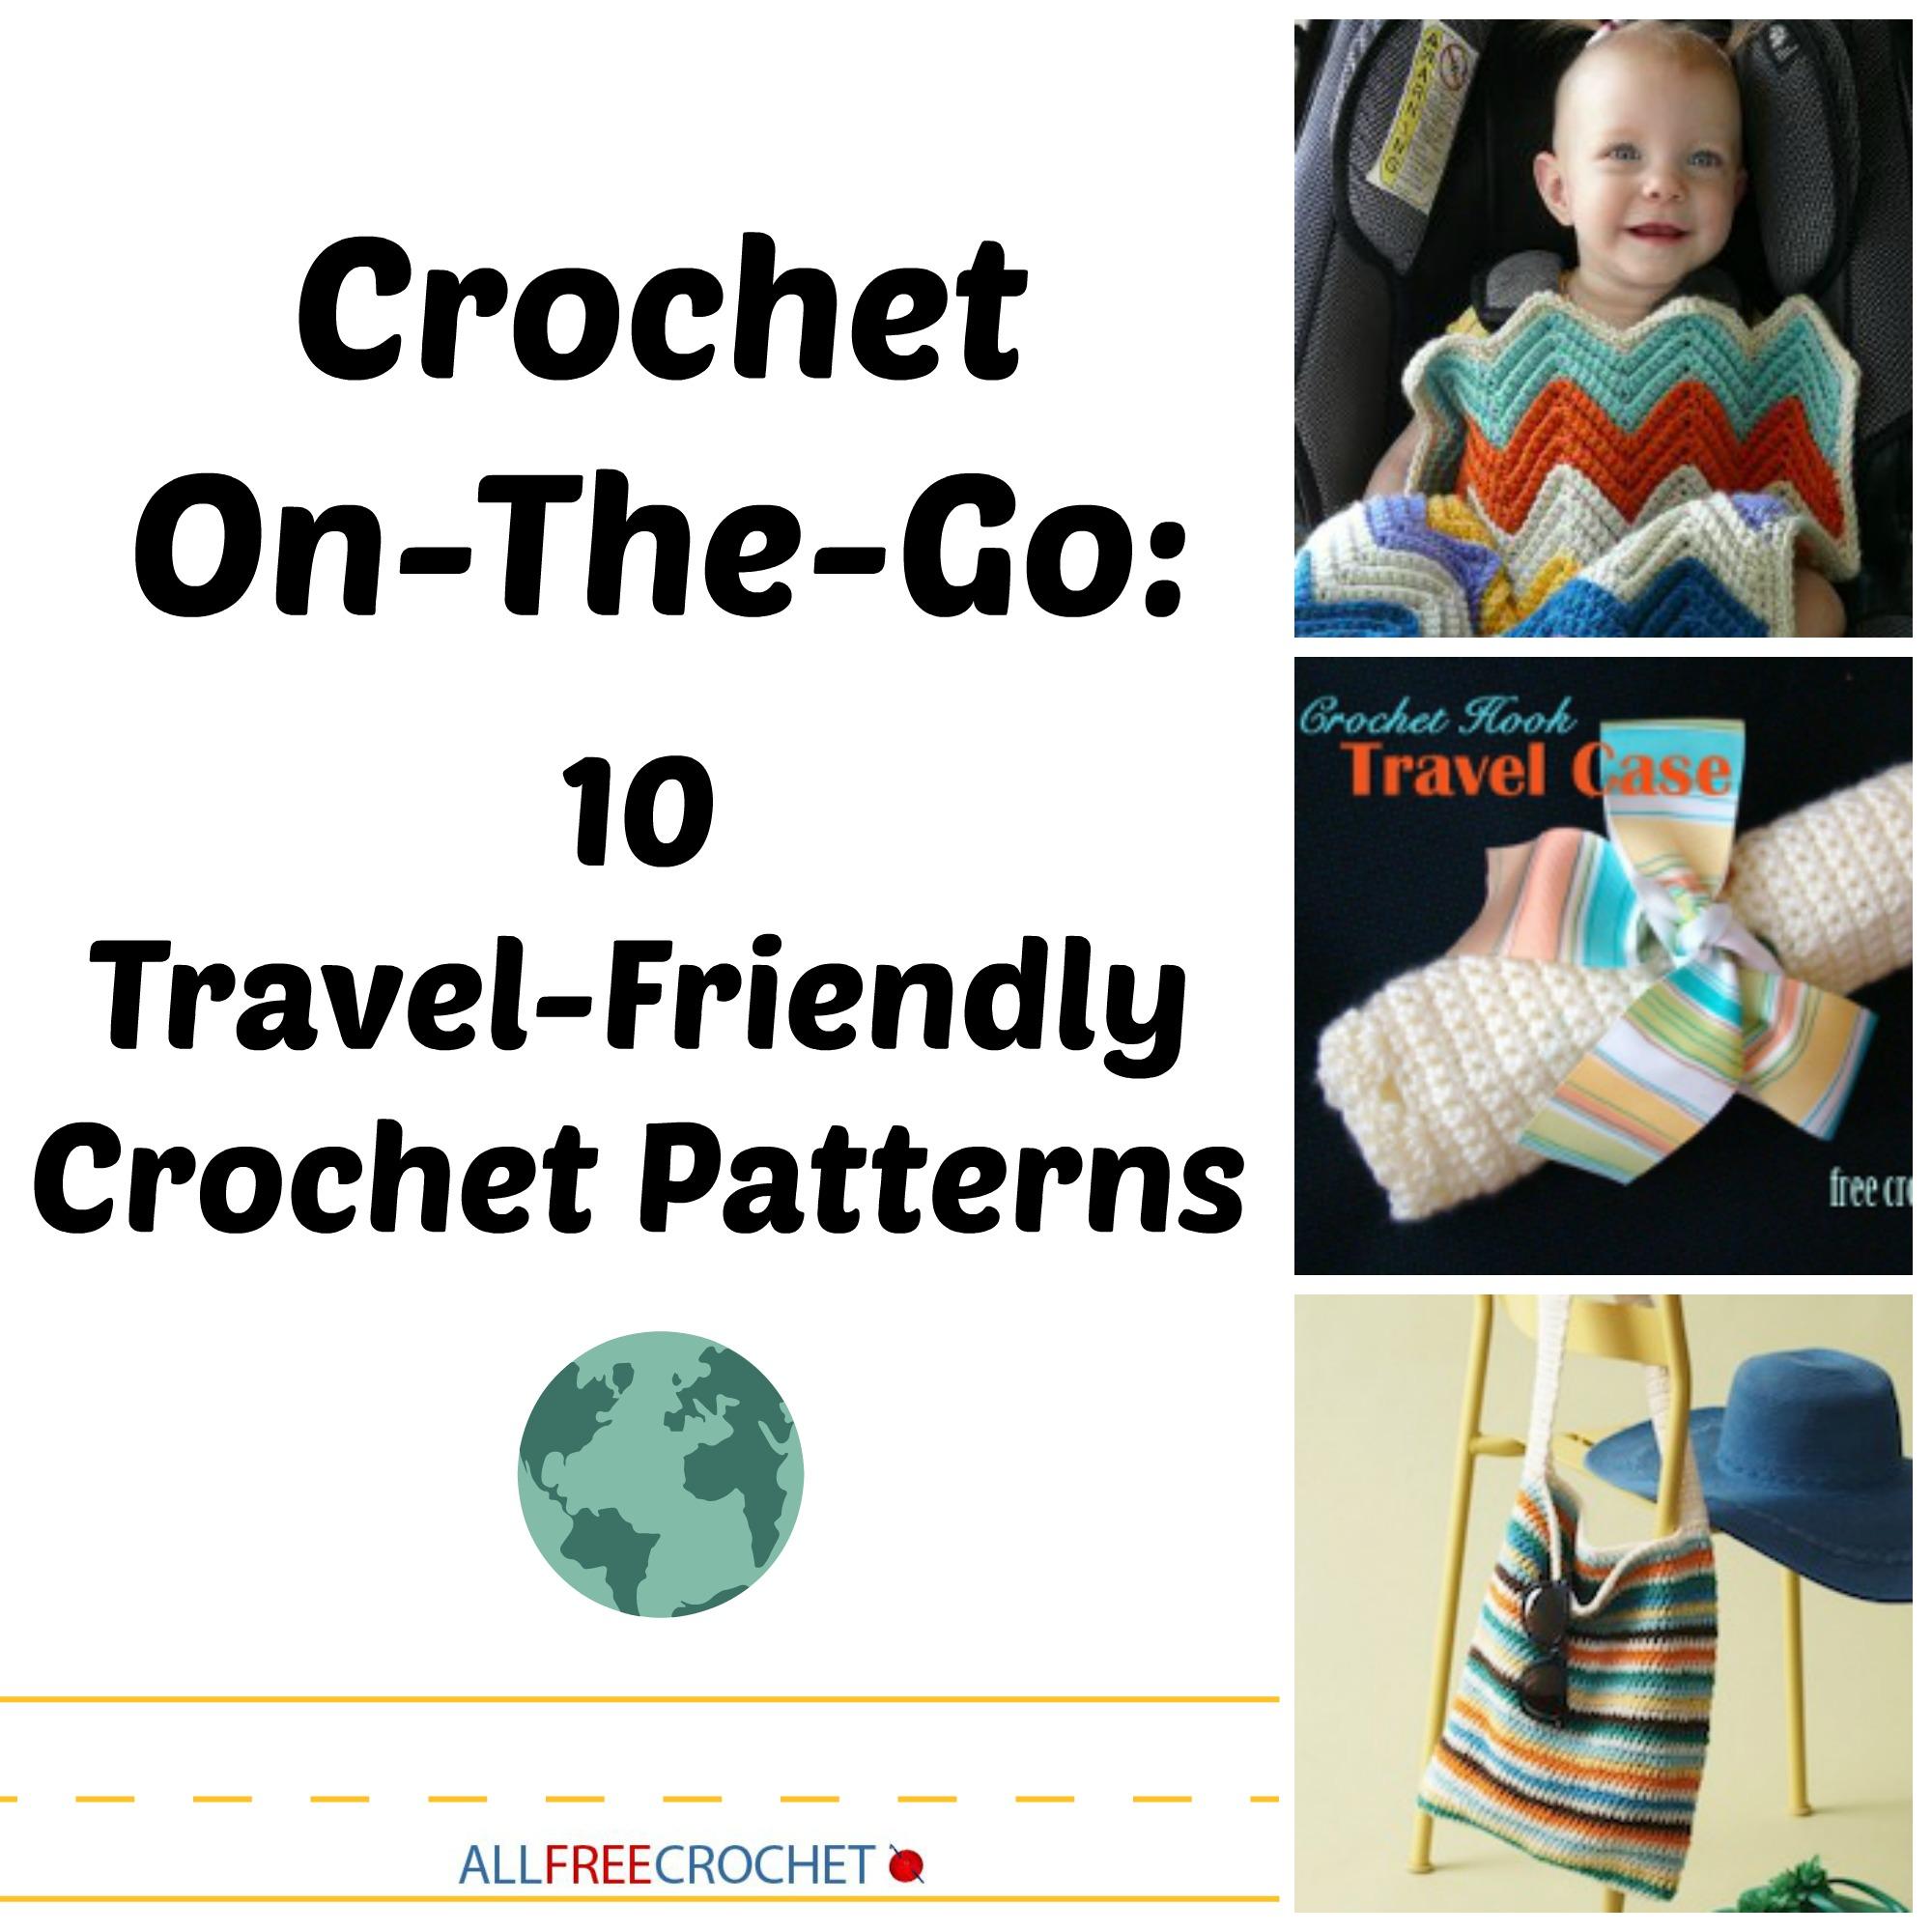 Crochet On The Go: 10 Travel-Friendly Crochet Patterns